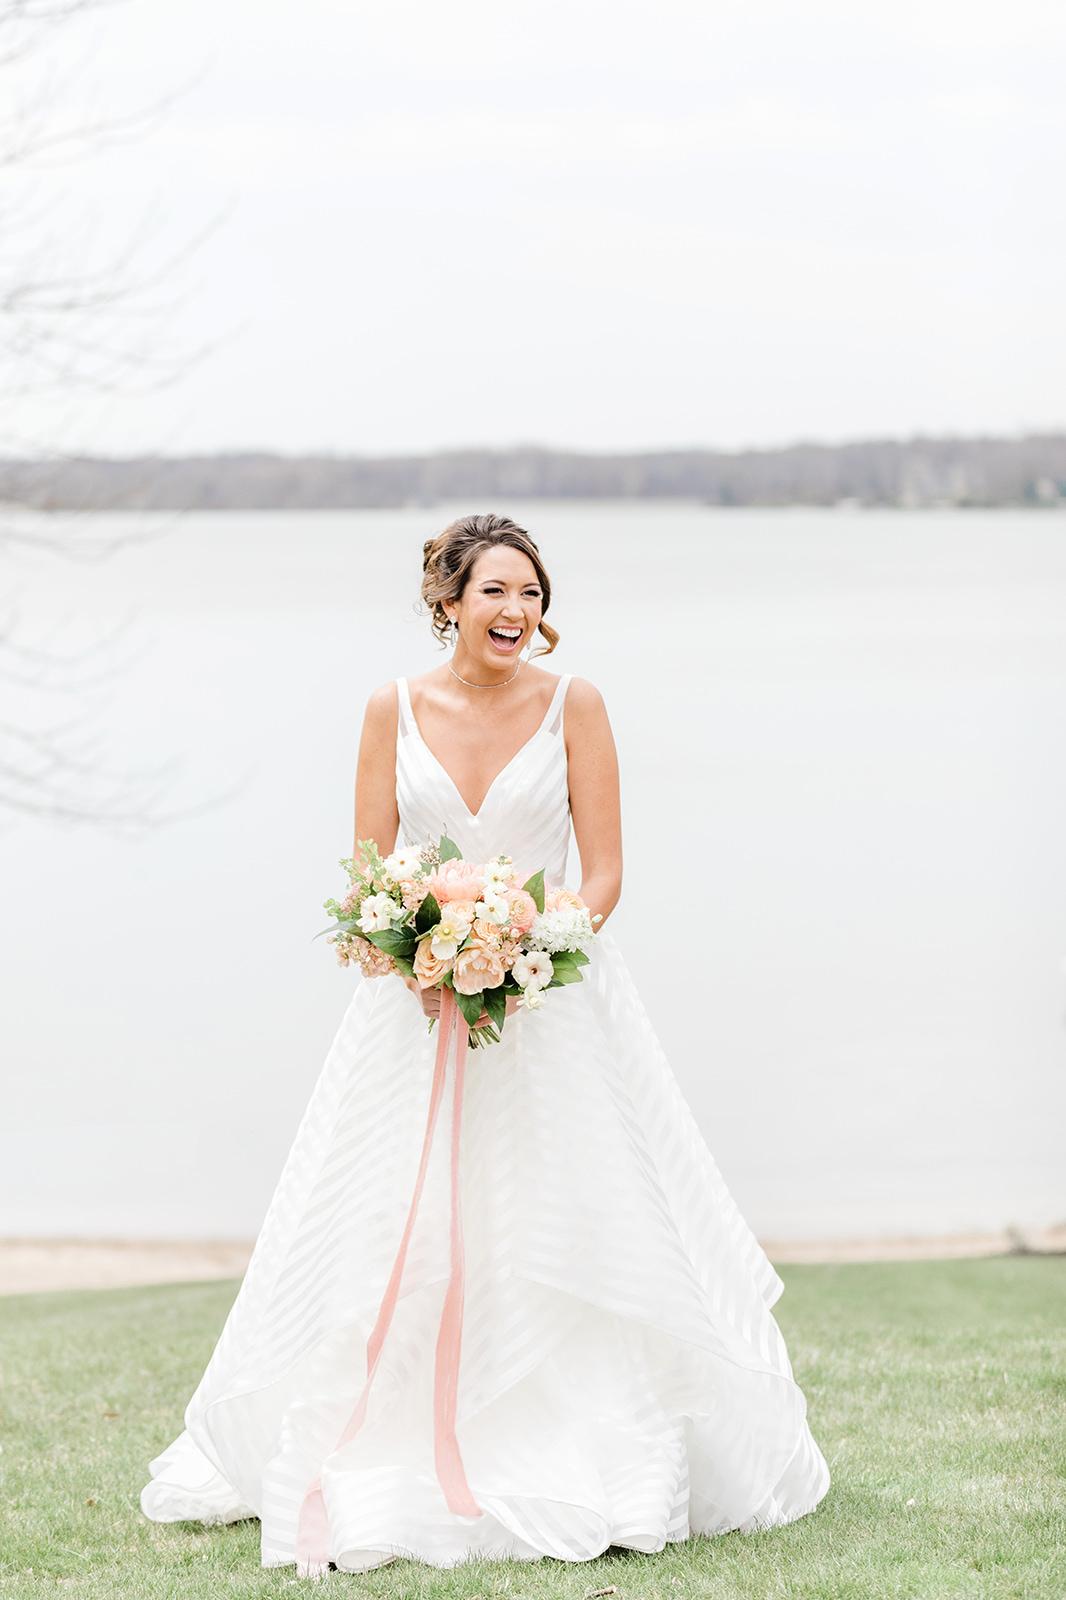 Jordan-Jake-Hayley-Paige-Real-Bride-Decklyn